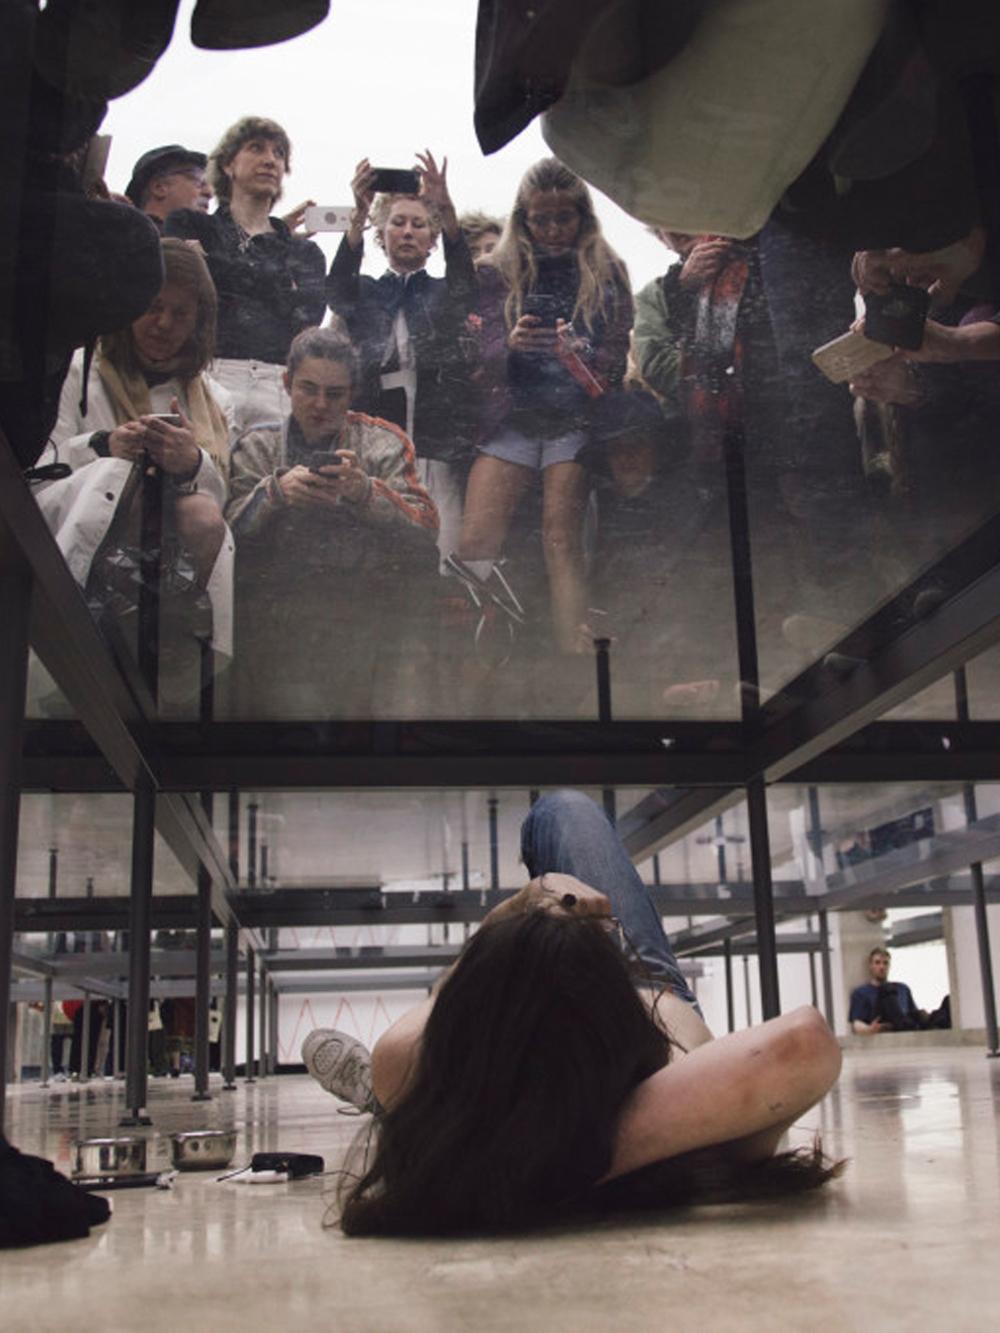 Anne Imhof, Faust, 2017. German Pavilion, 57th International Art Exhibition – La Biennale di Venezia © Photography: Nadine Fraczkowski. Courtesy: German Pavilion 2017 and the artist